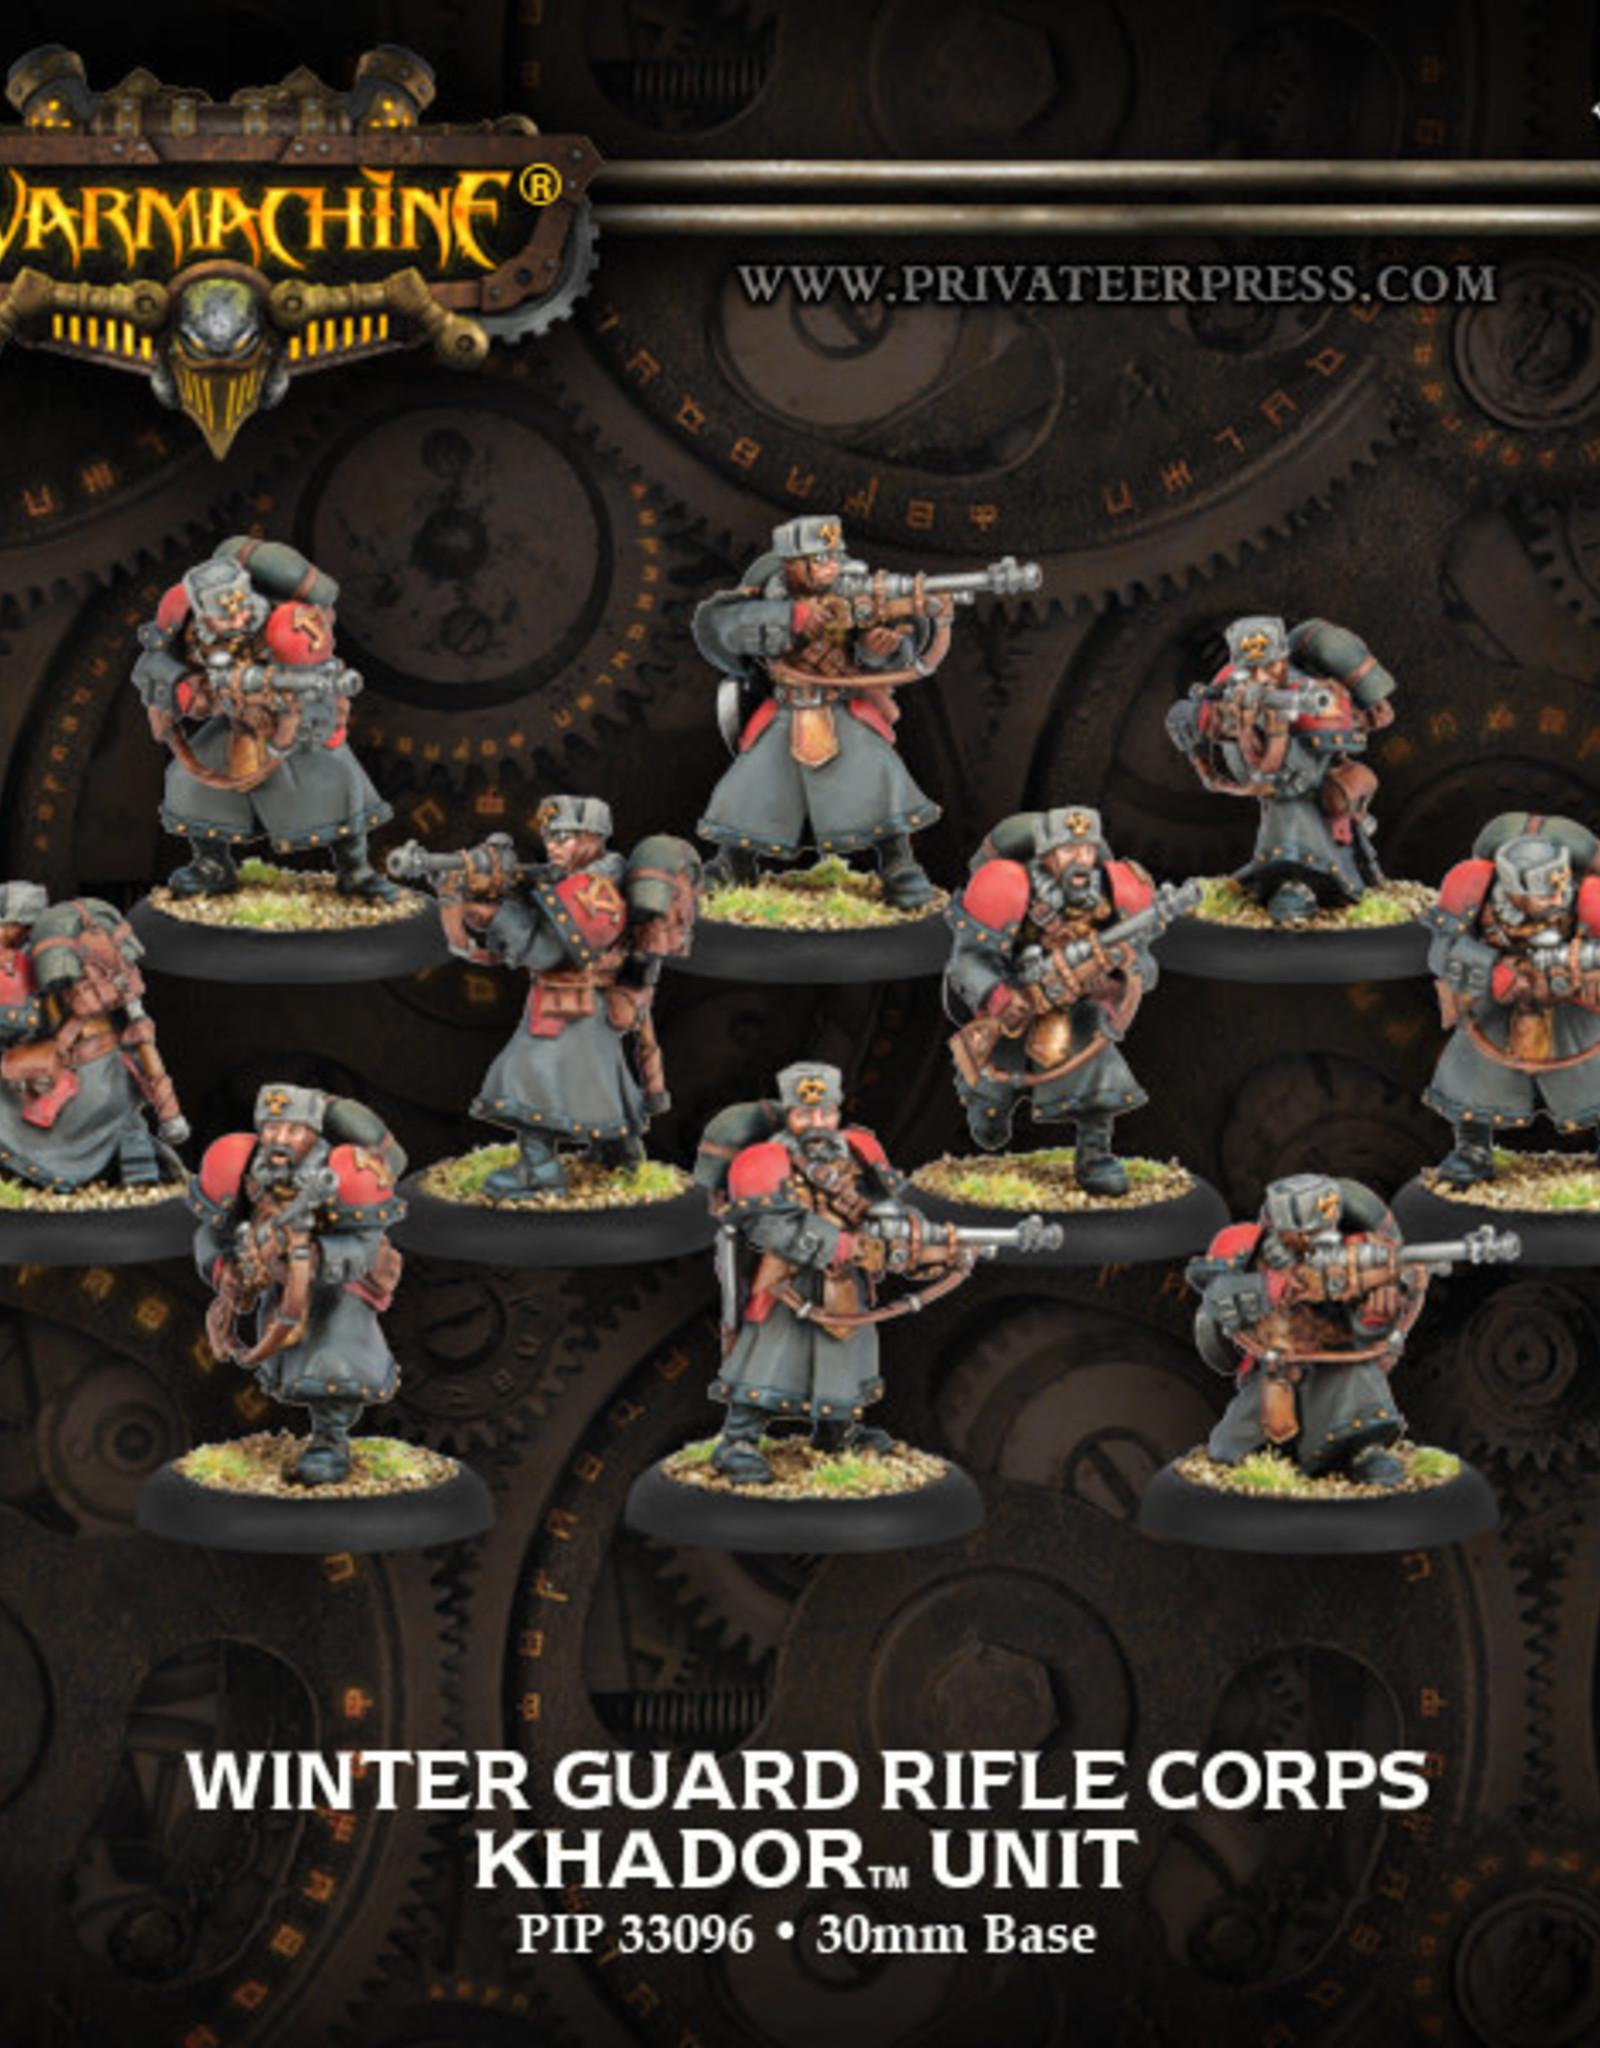 Warmachine Khador - Rifle Corps Plastic